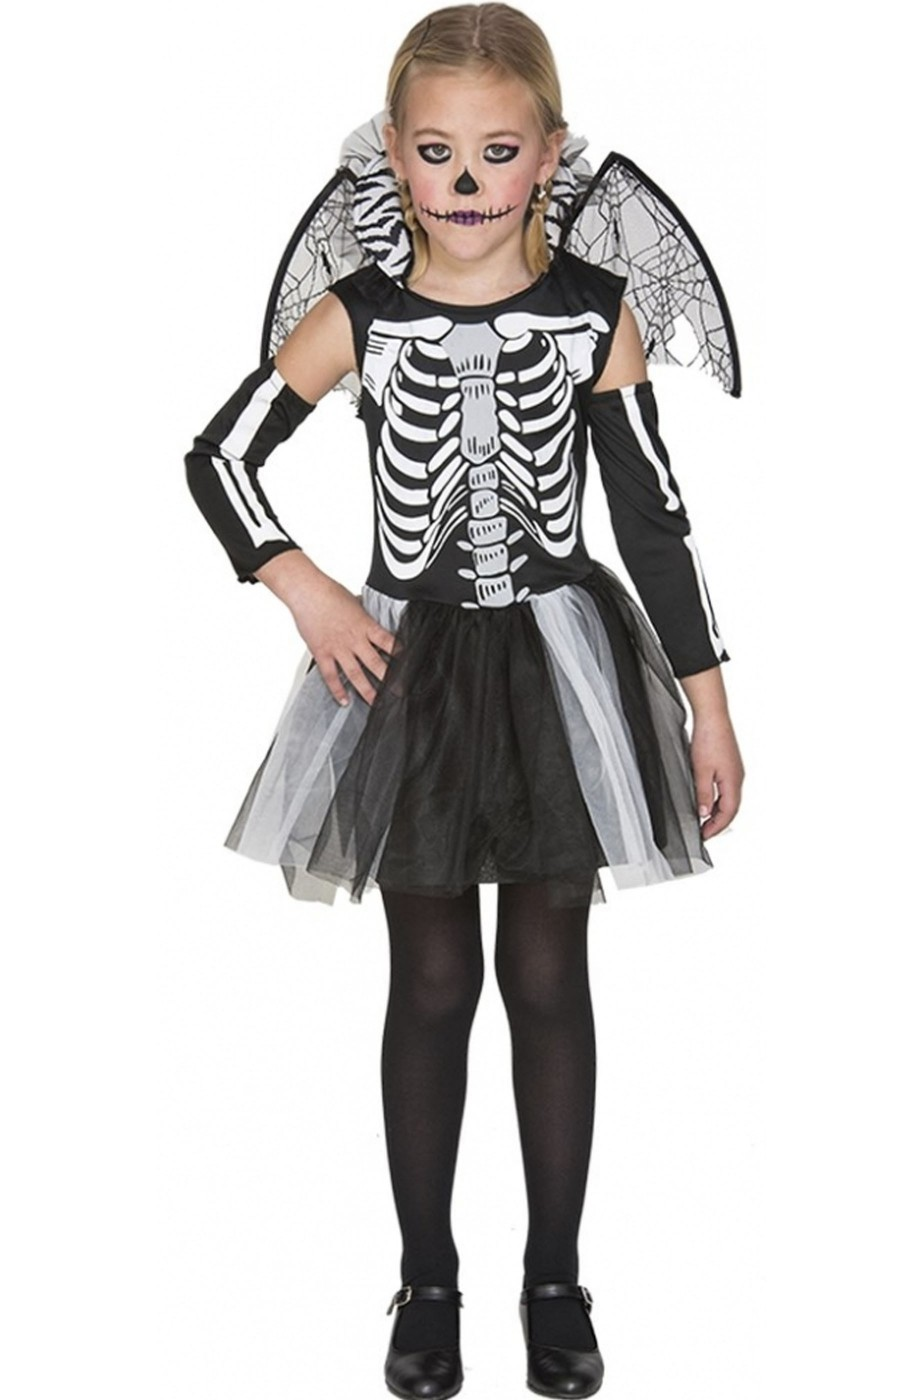 Costume per Halloween da bambina da scheletro